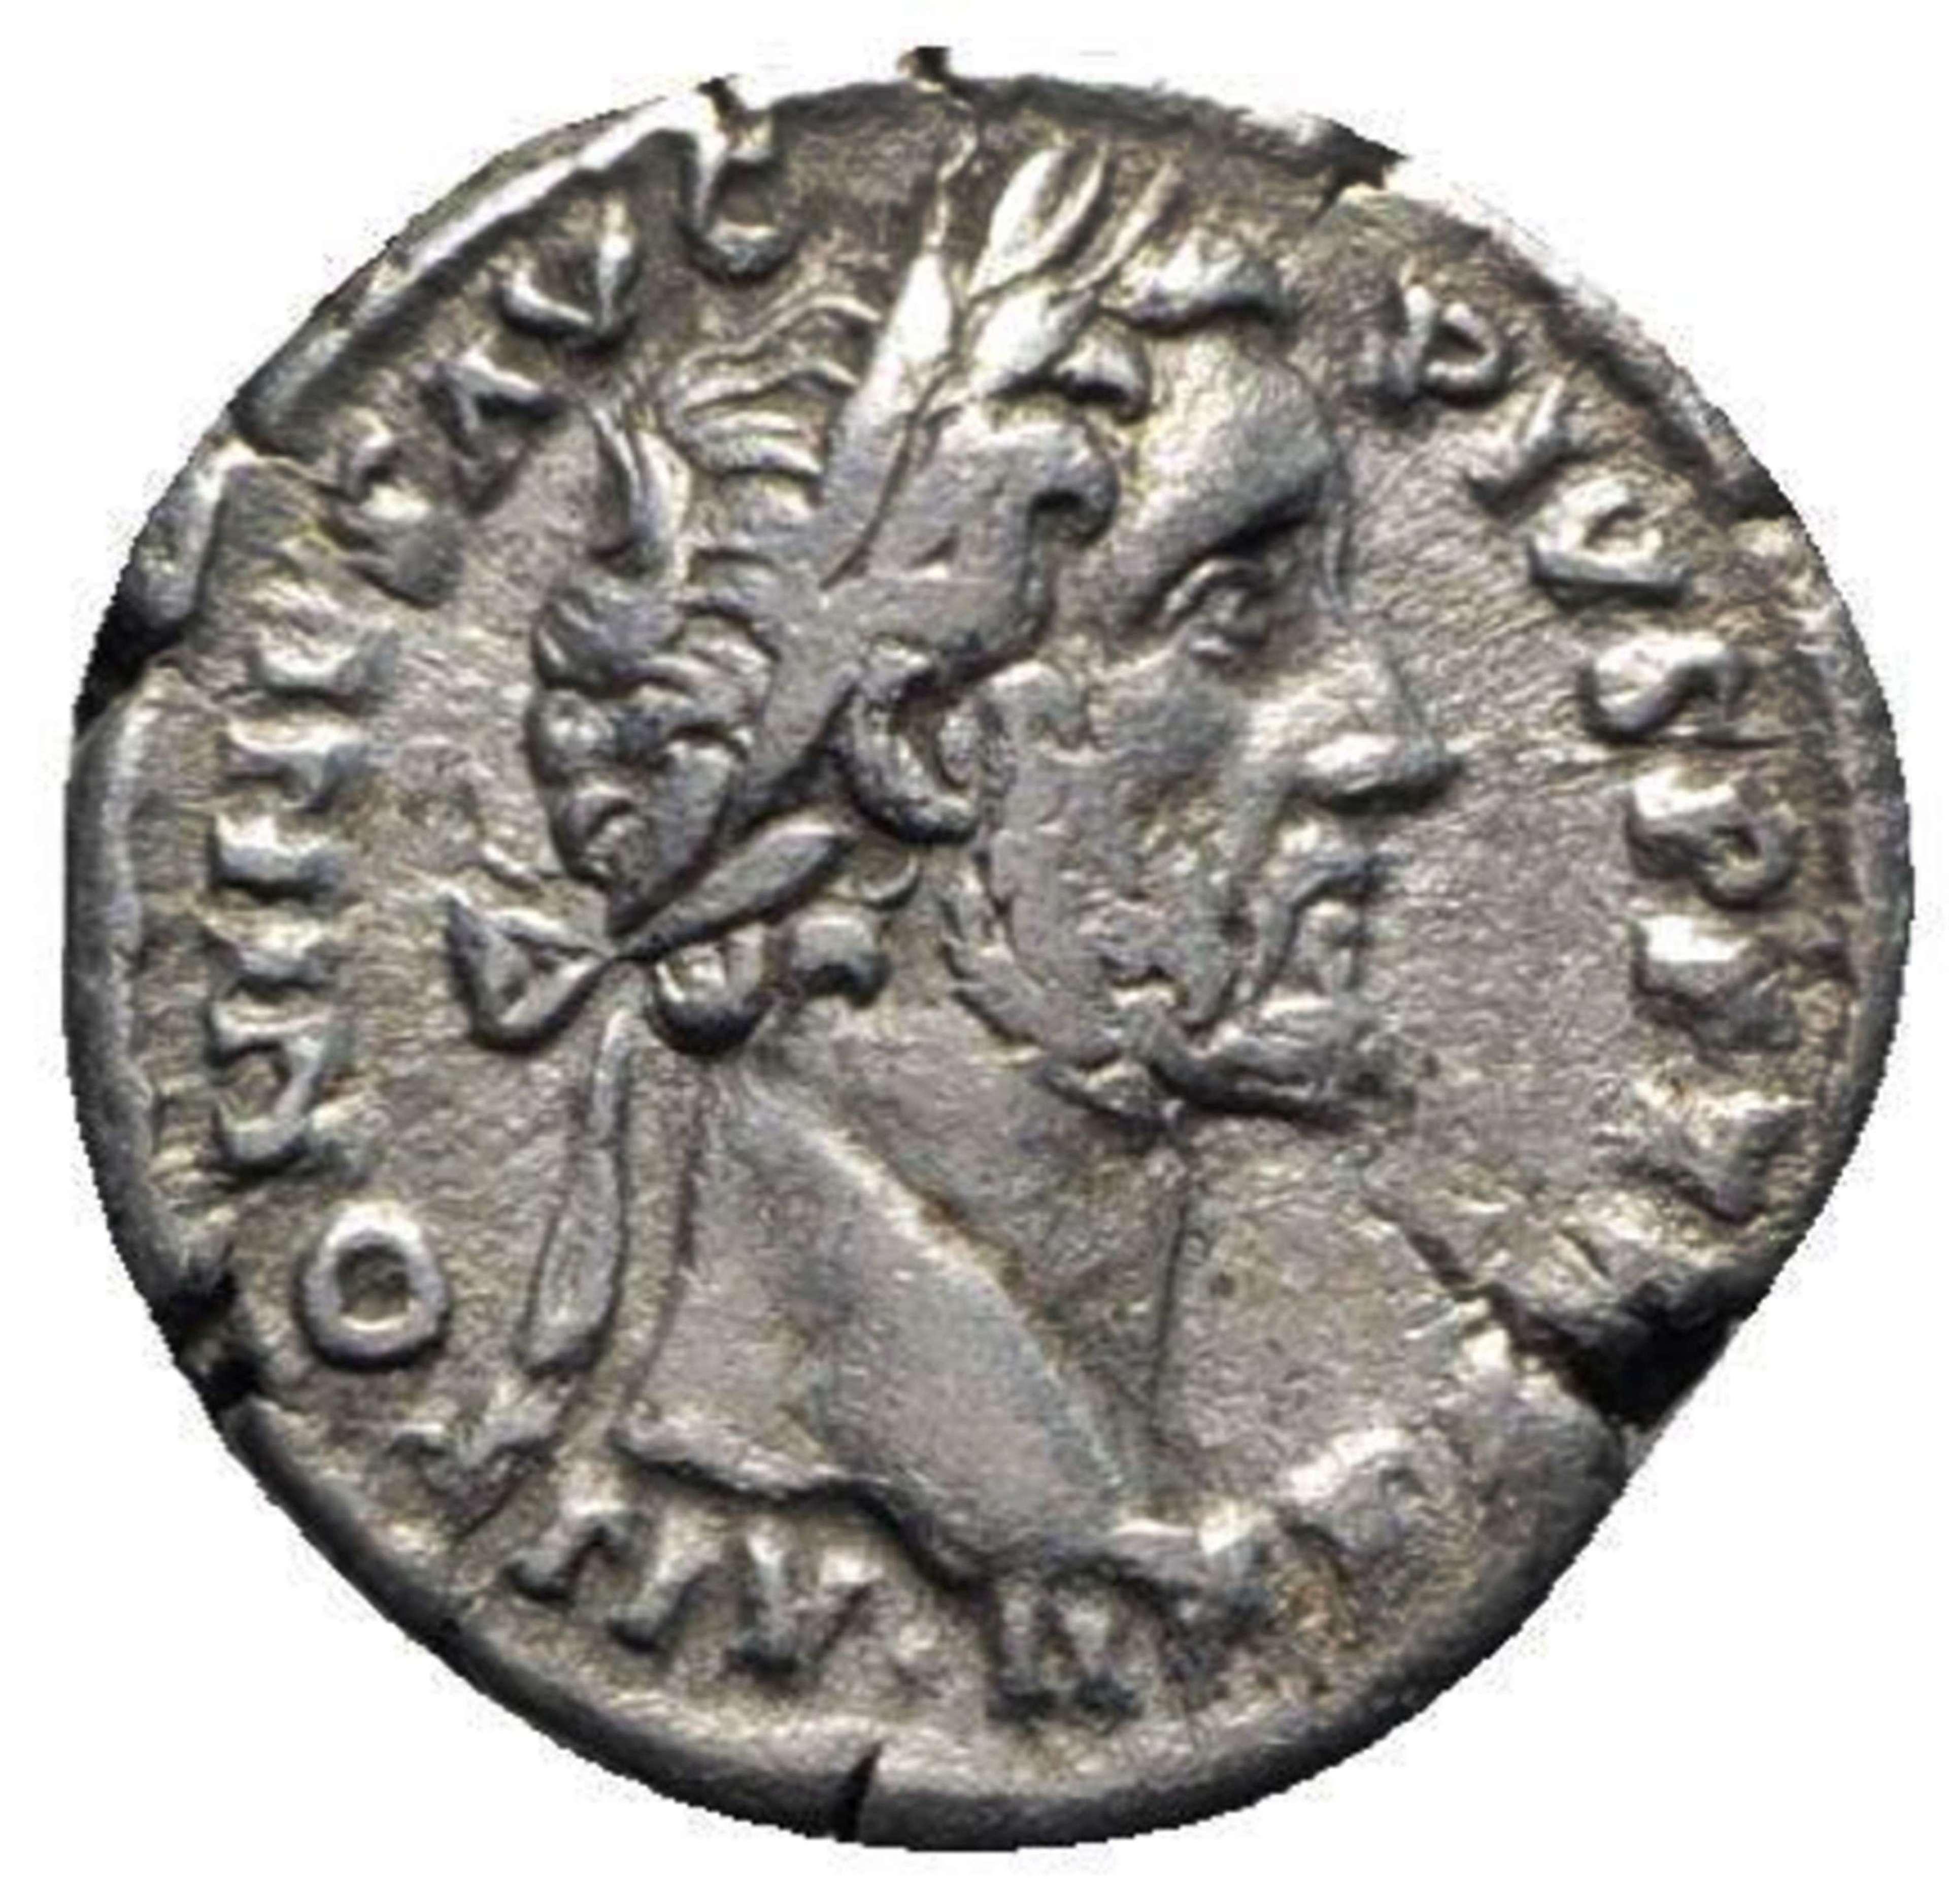 Ancient Roman Silver Denarius of Emperor Antoninus Pius /